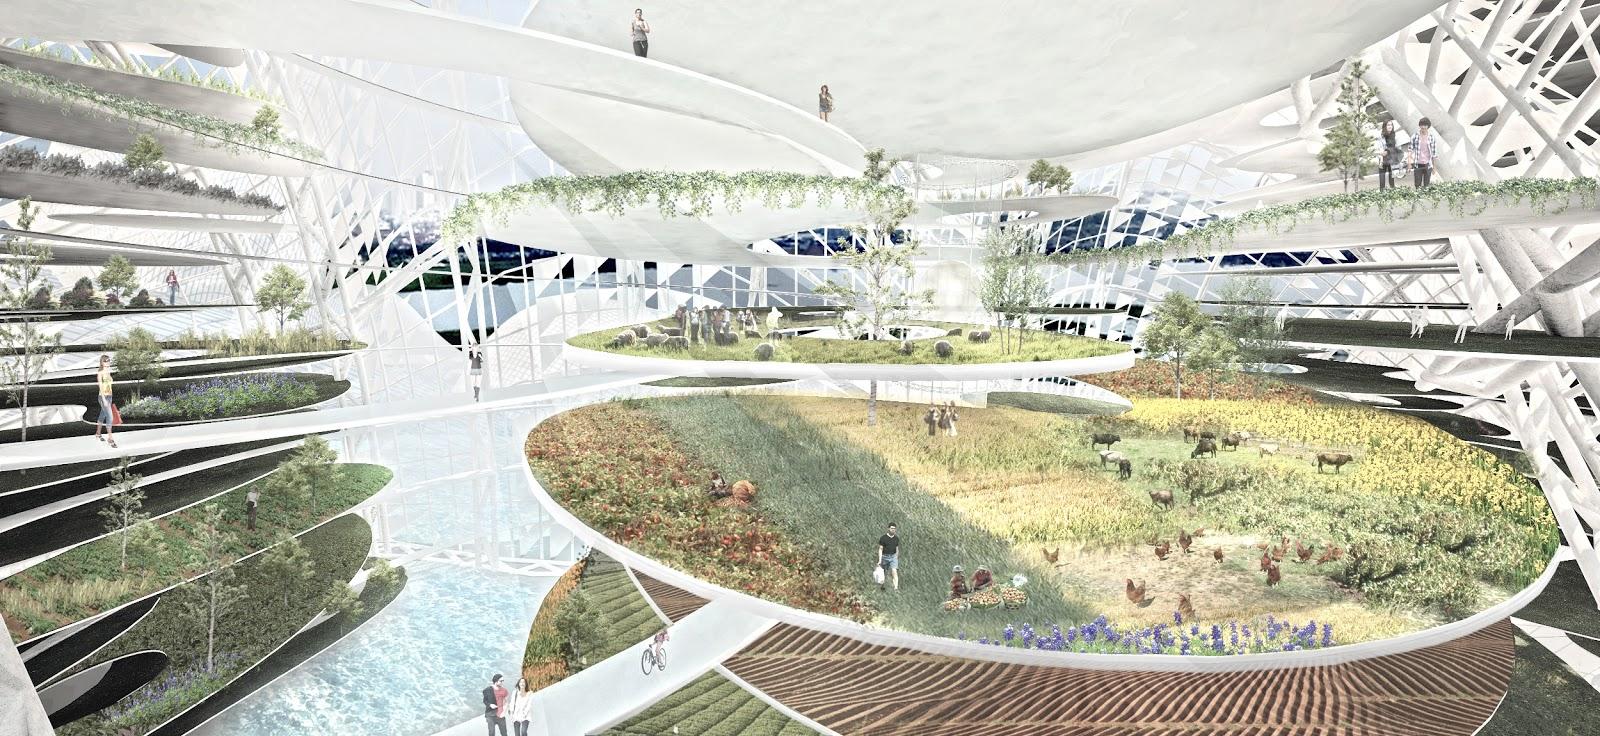 coba coba gonzo fluidscape city urban development for contemporary reservoir city project. Black Bedroom Furniture Sets. Home Design Ideas